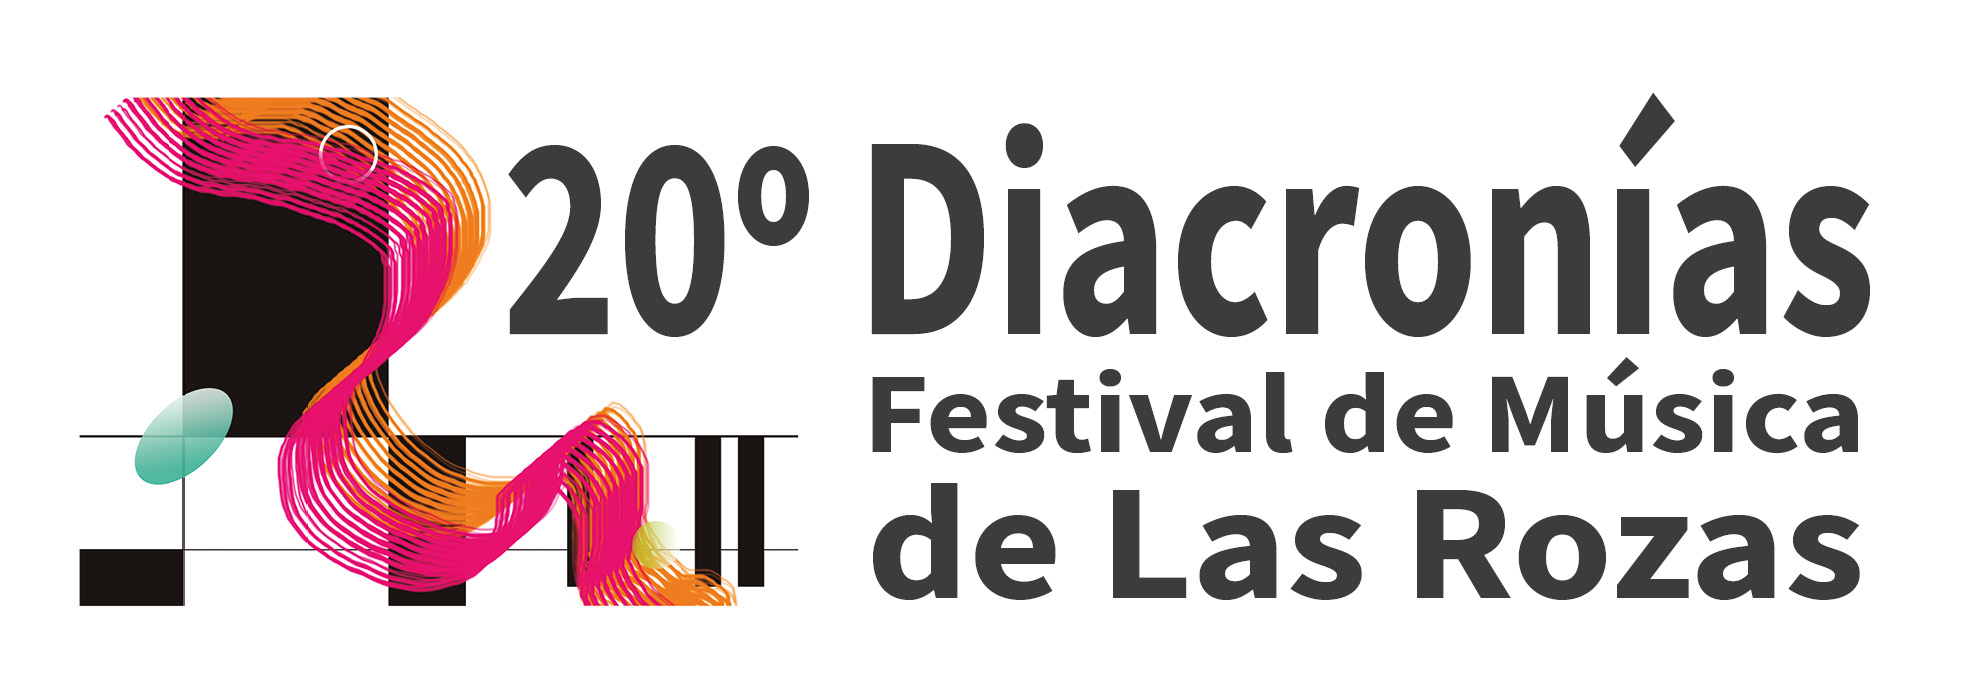 logo festival diacronias